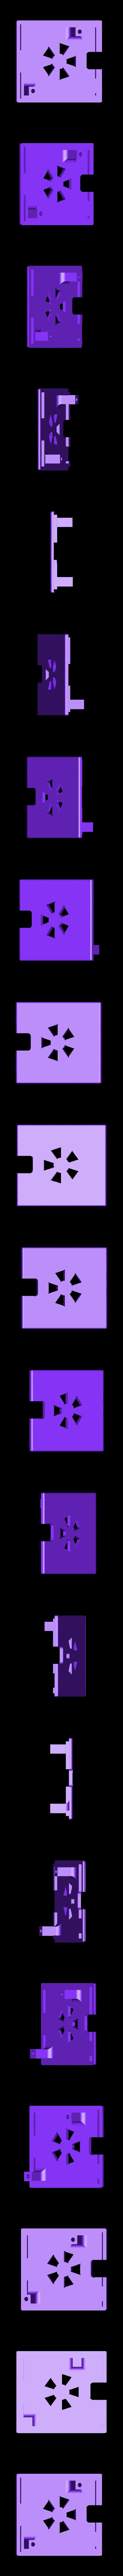 PCM2704_box_top.stl Download free STL file (Pi) USB&SPDIF sound card PCM2704 box • 3D printable template, mschiller